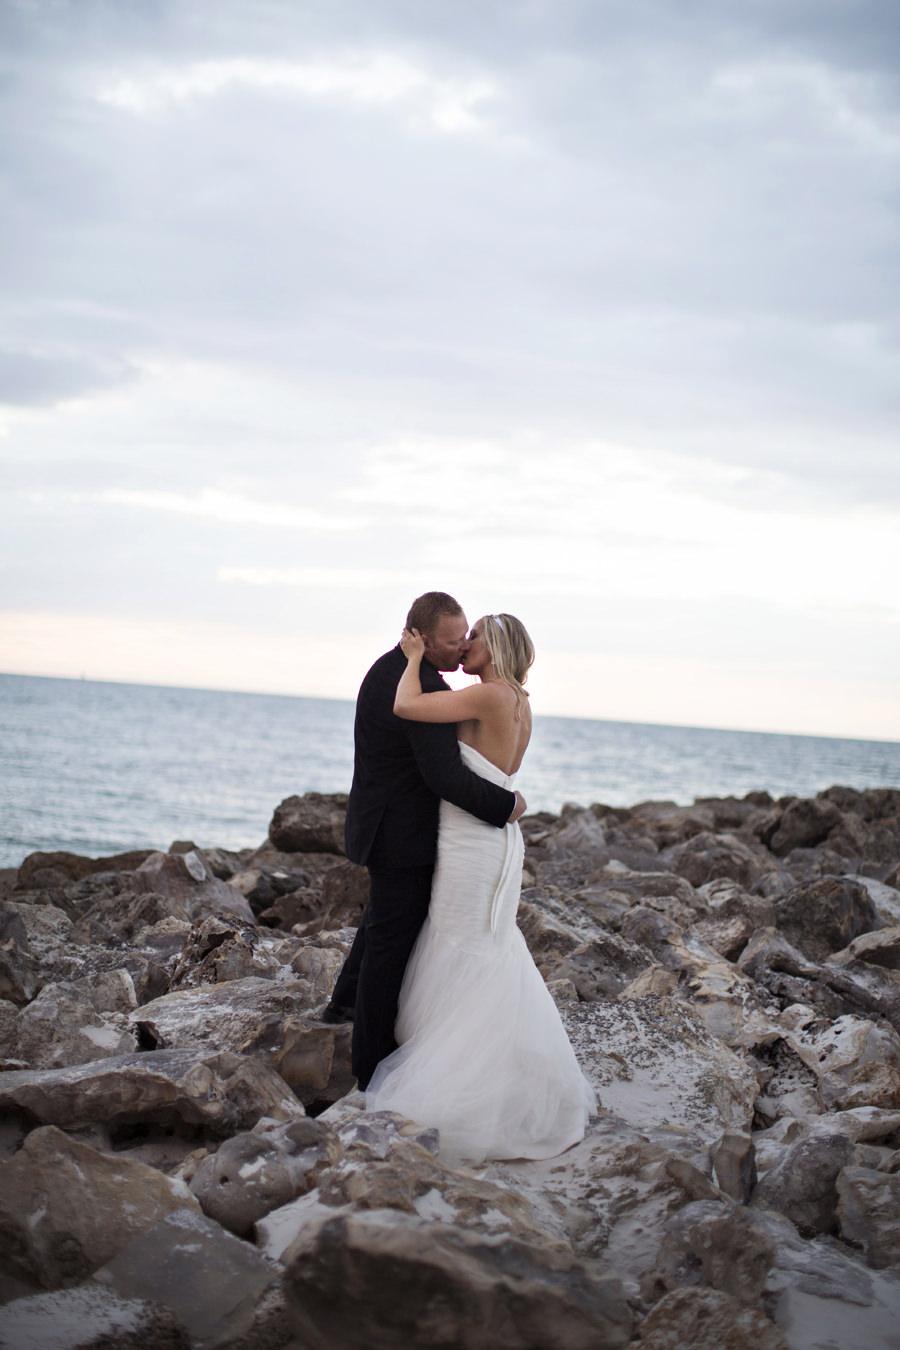 Bridal and Groom Outdoor Wedding Portrait on Rocks | Clearwater Beach Wedding Photographer Djamel Photography